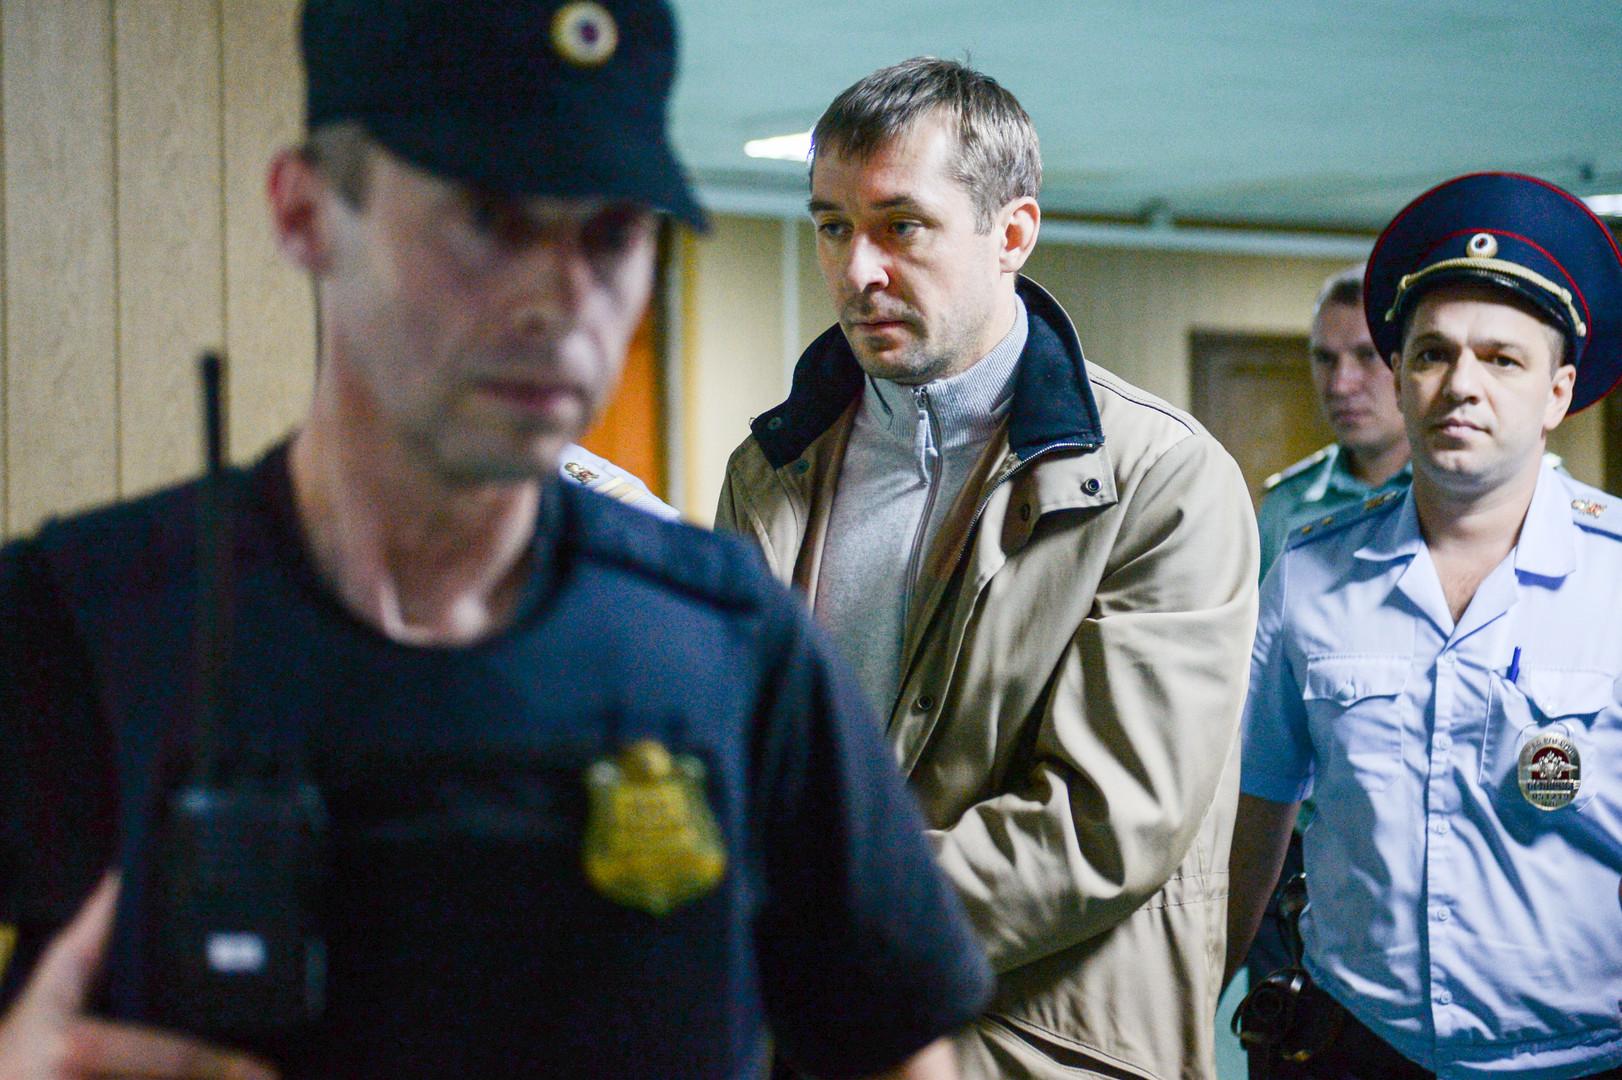 Полковник и миллиардер: что известно об аресте Дмитрия Захарченко